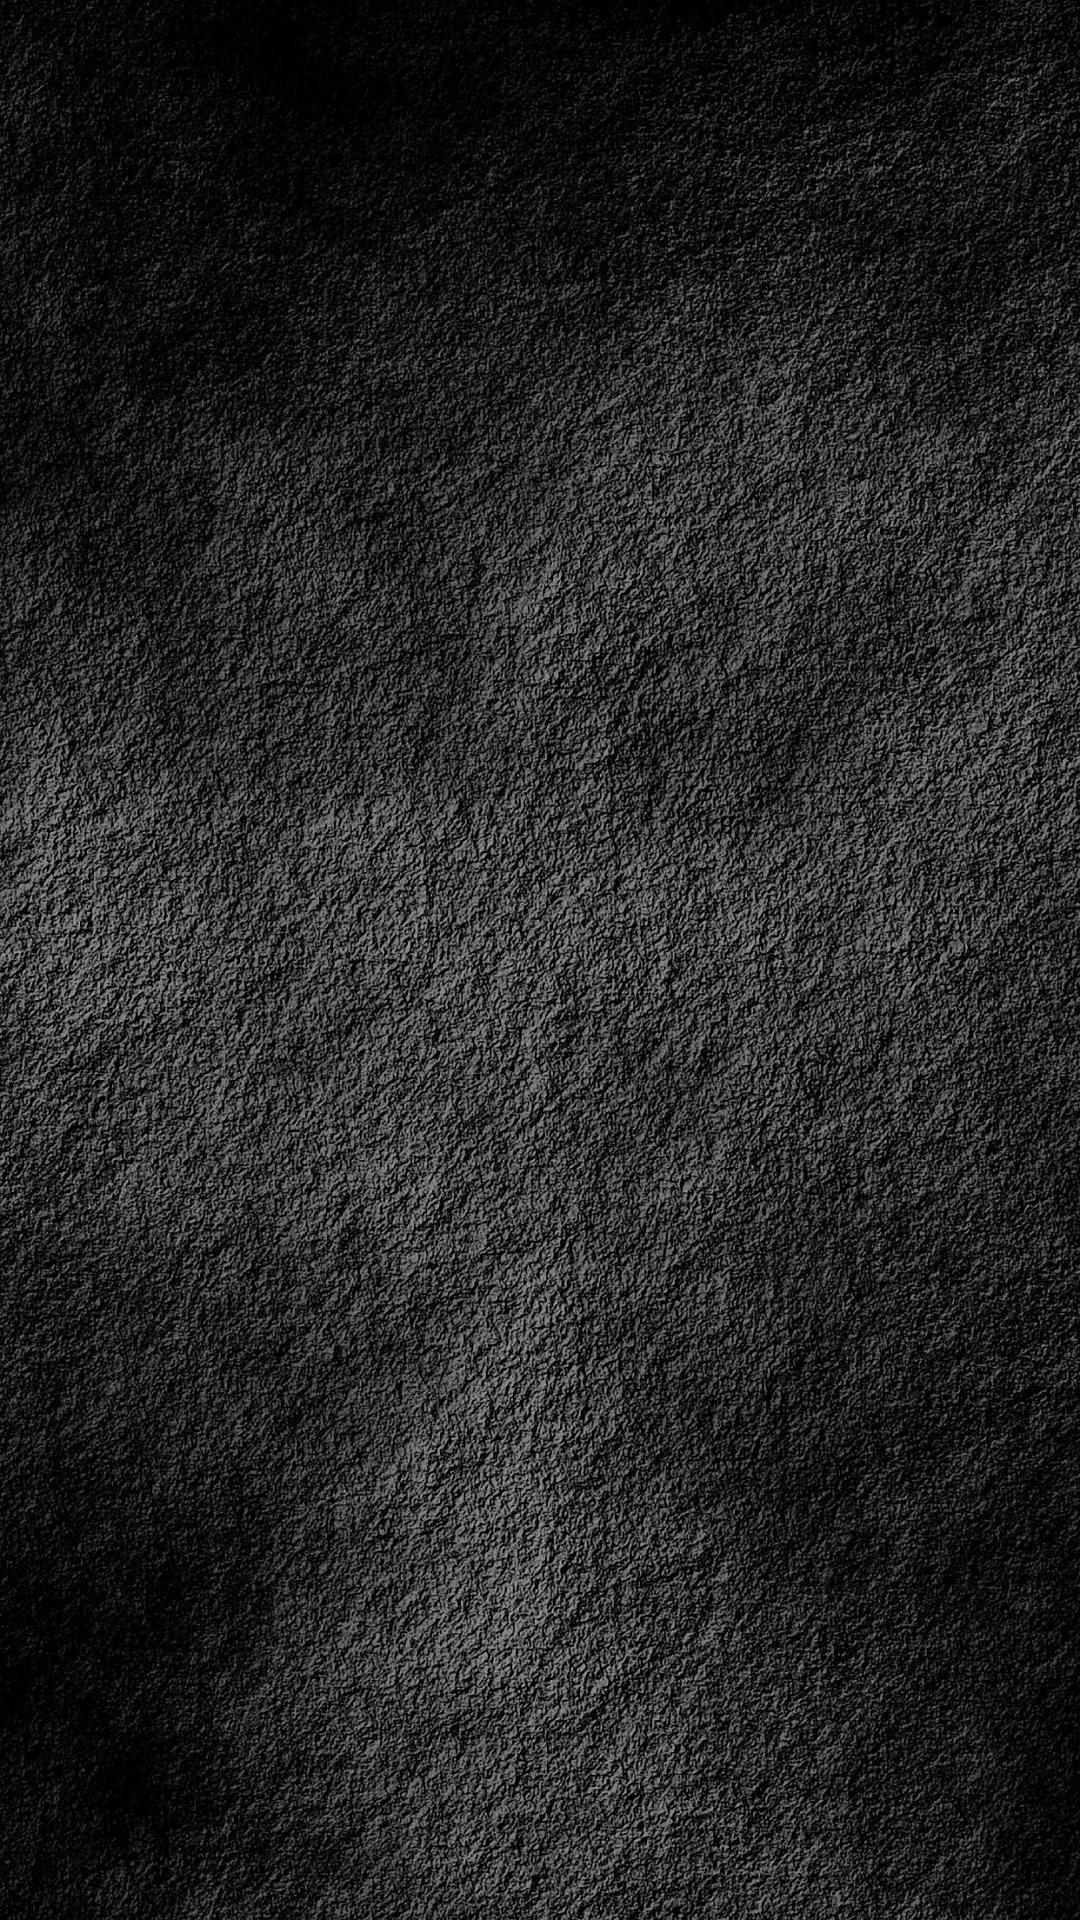 Dark Abstract Iphone 6 Wallpapers Hd Dark Grey Wallpaper Iphone 1080x1920 Wallpaper Teahub Io